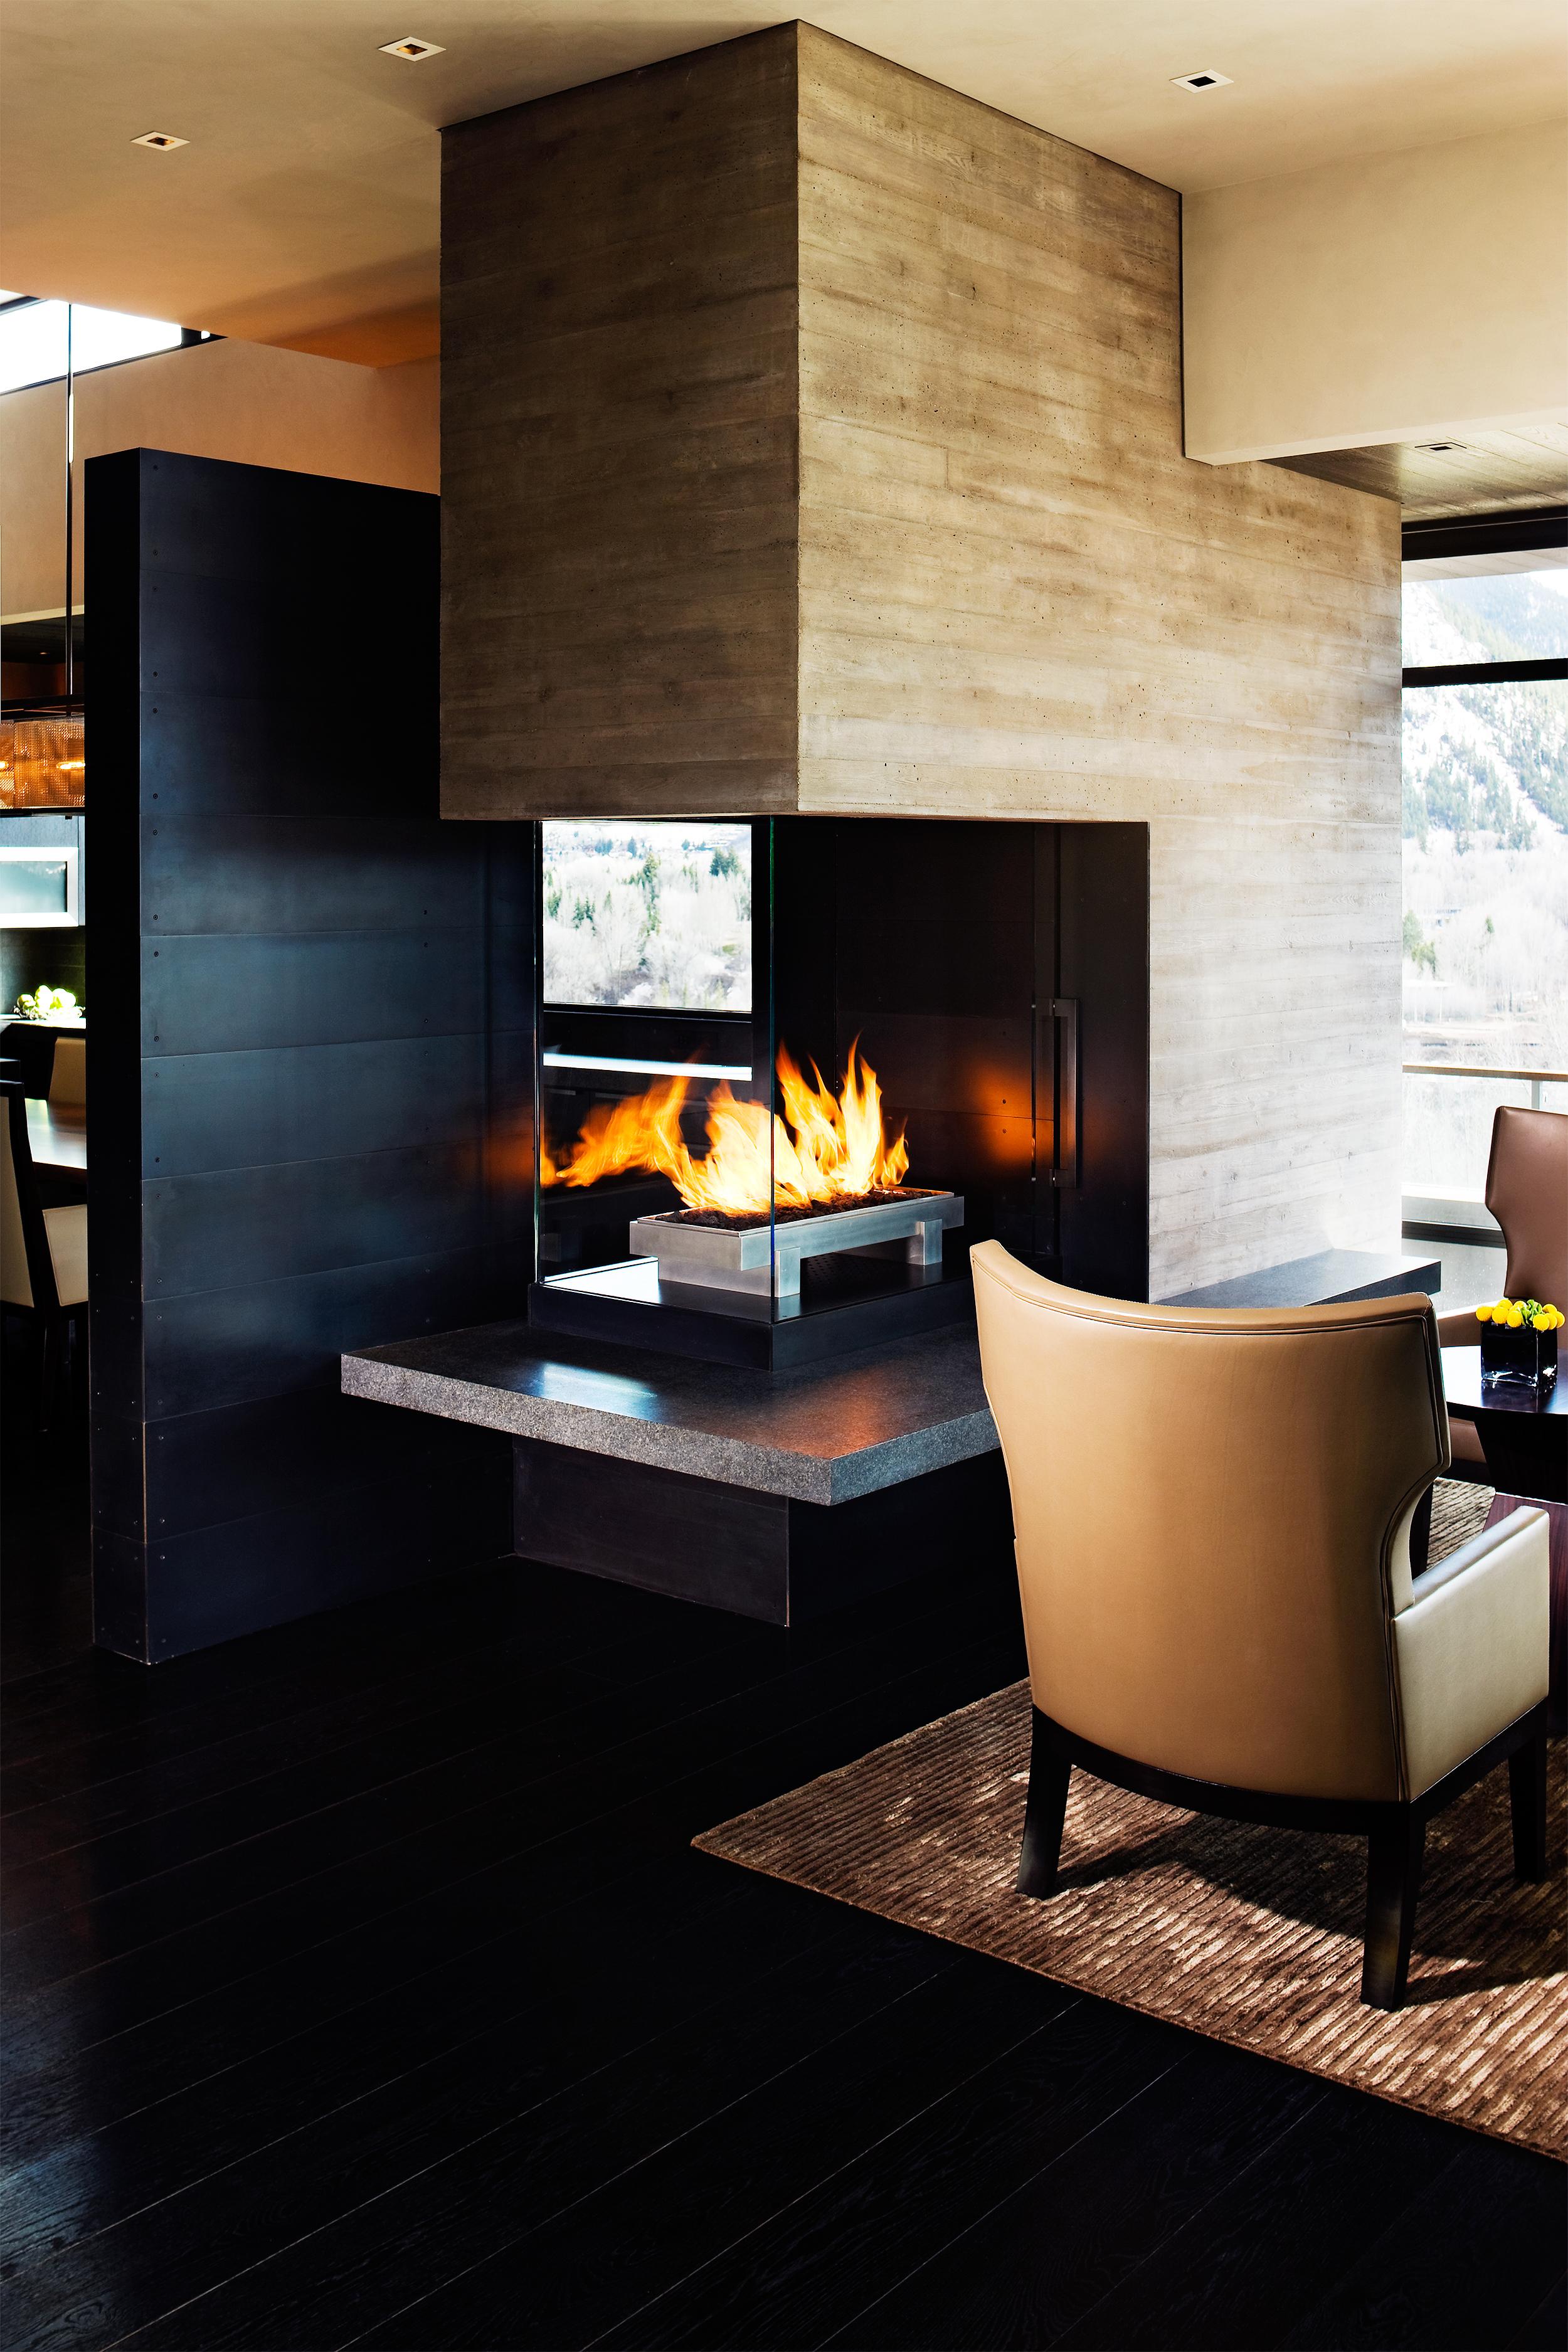 b&gdesign-fireplace.jpg